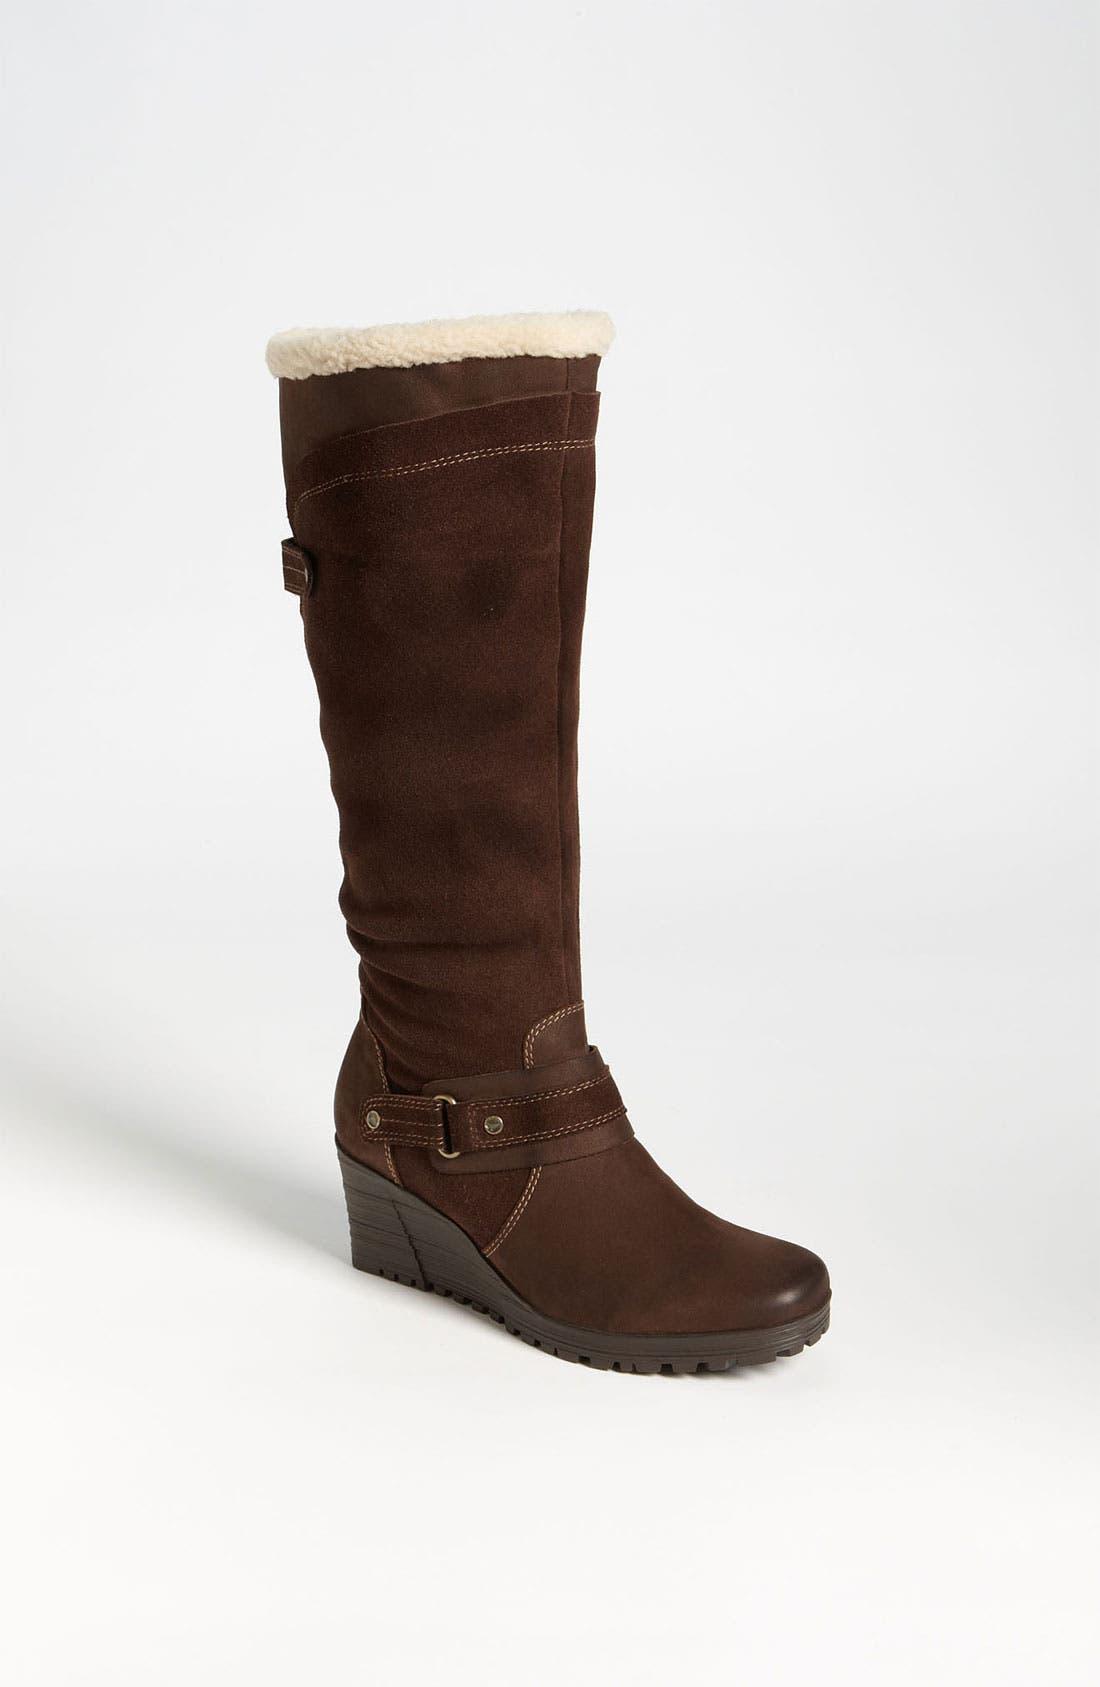 Main Image - Earth® 'Ridge' Boot